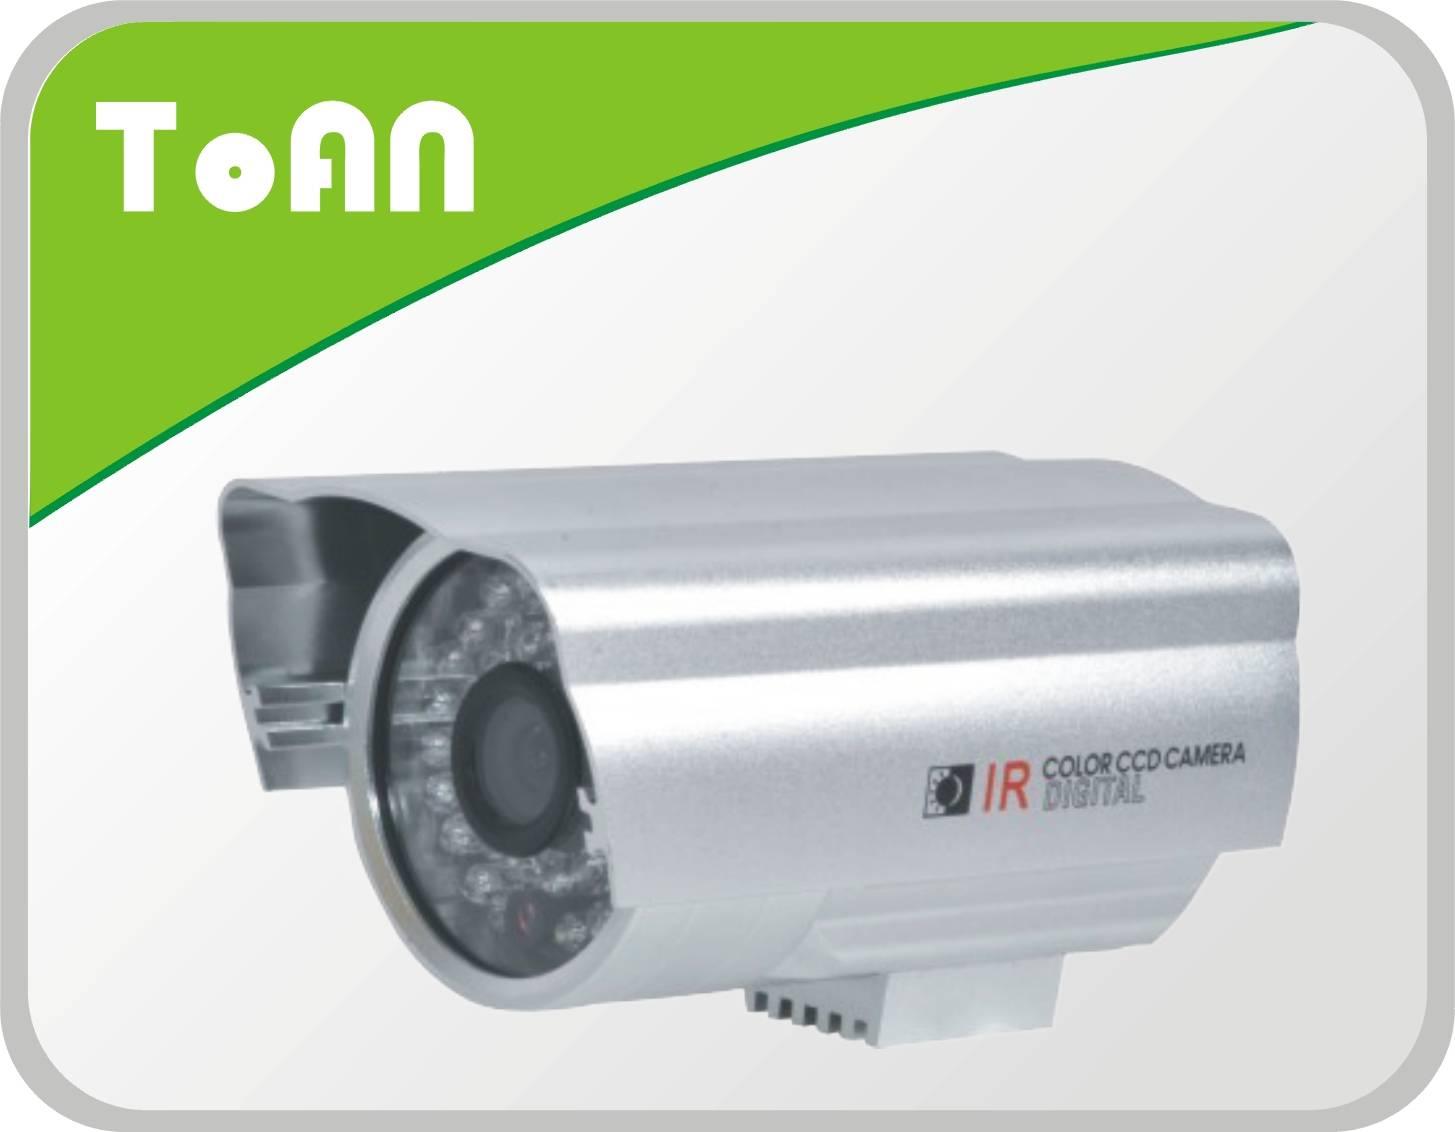 TOAN 72 pcs 5mm IR-LED ip66 Waterproof Camera waterproof ir50m ccd camera weatherproof camera